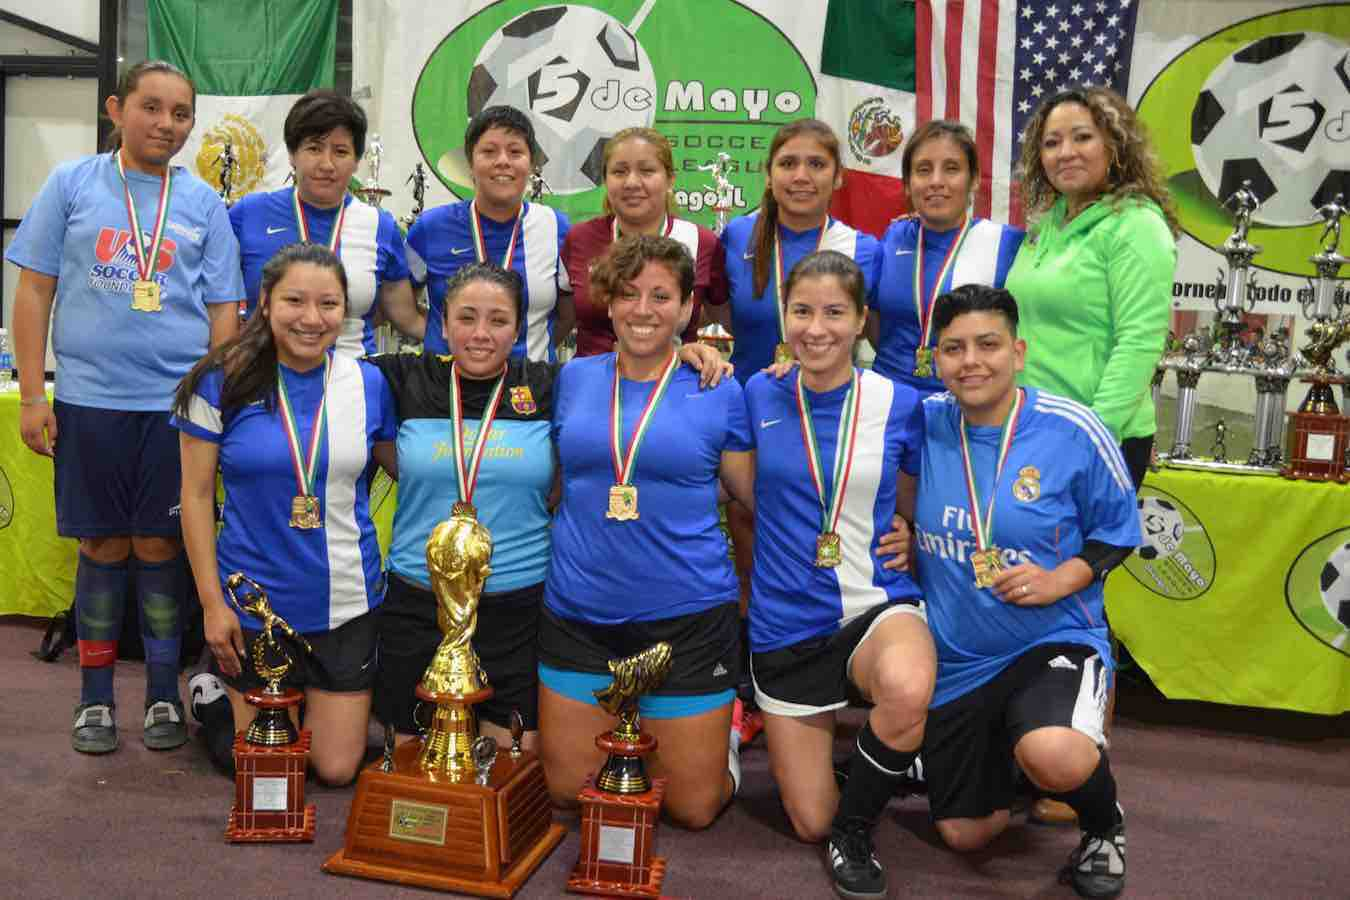 5 de Mayo Soccer League